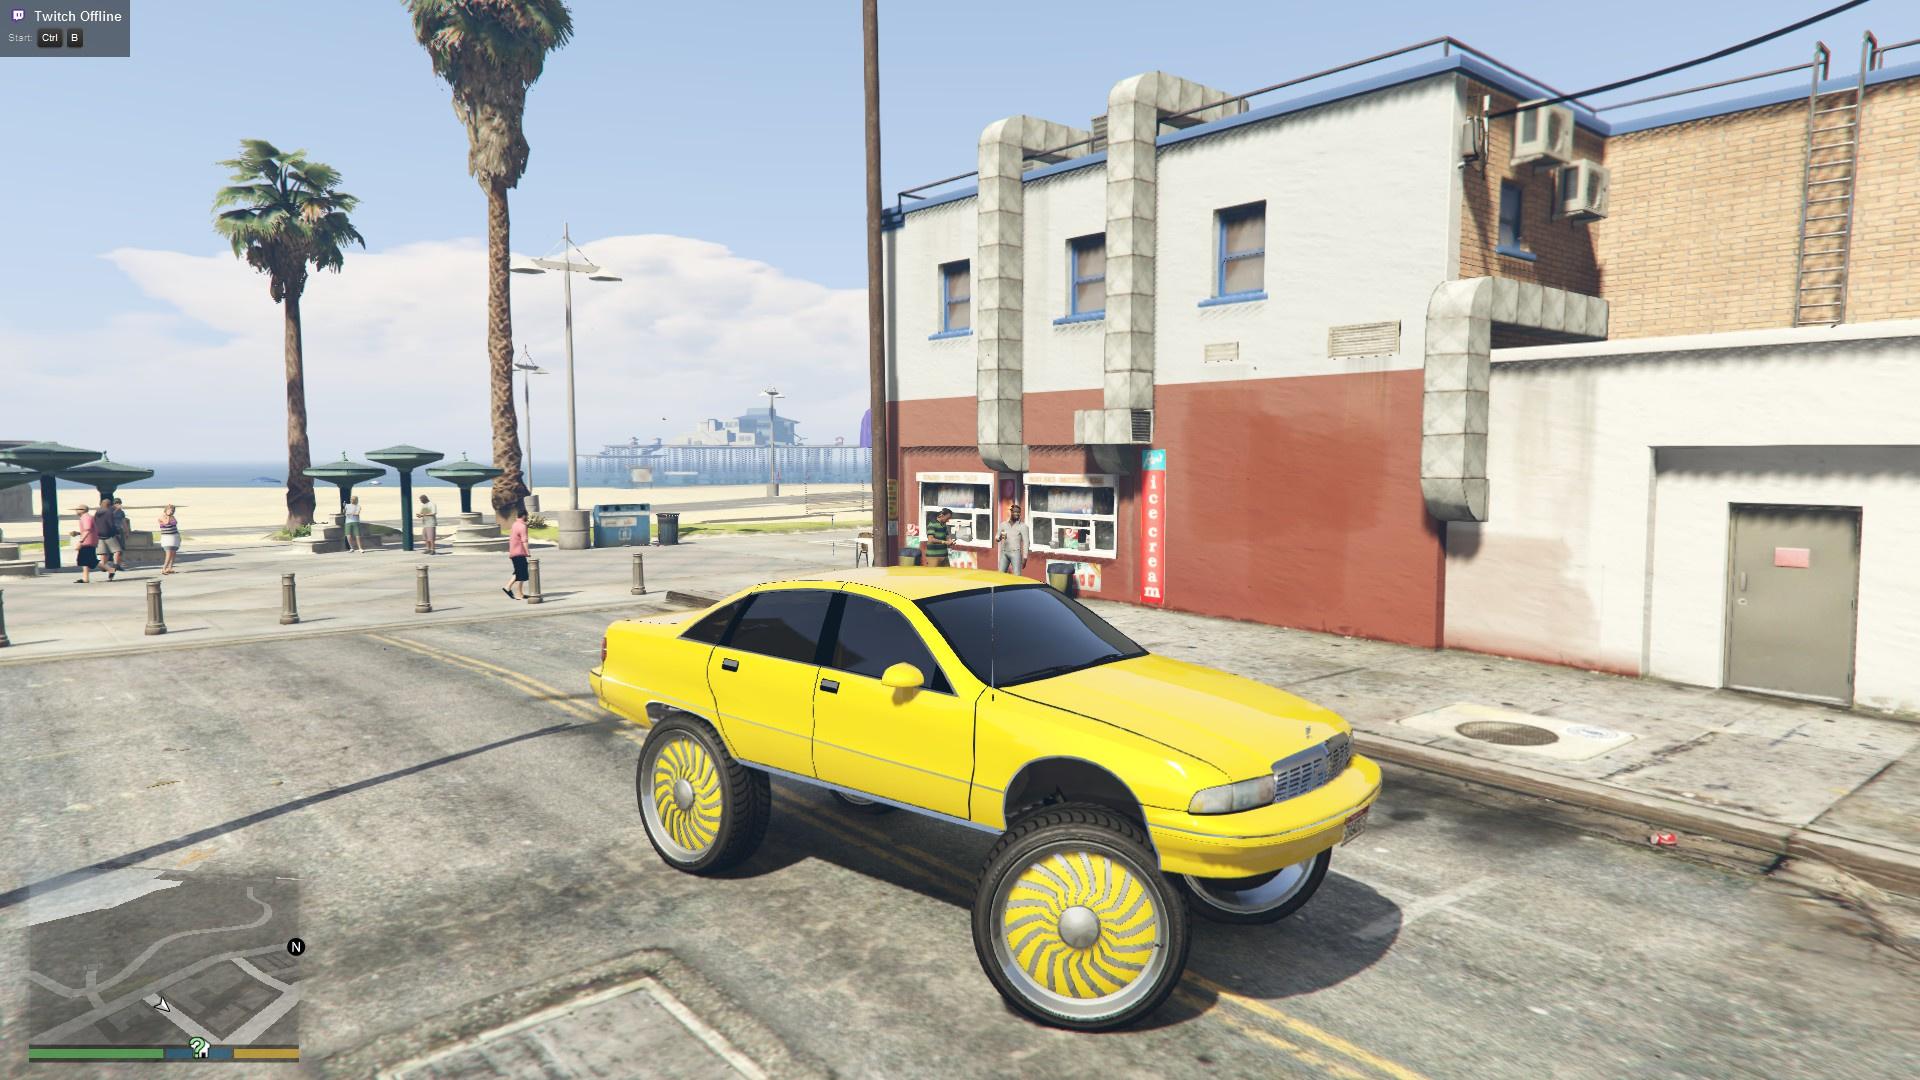 91 Chevy Caprice Donk Gta5 Mods Com